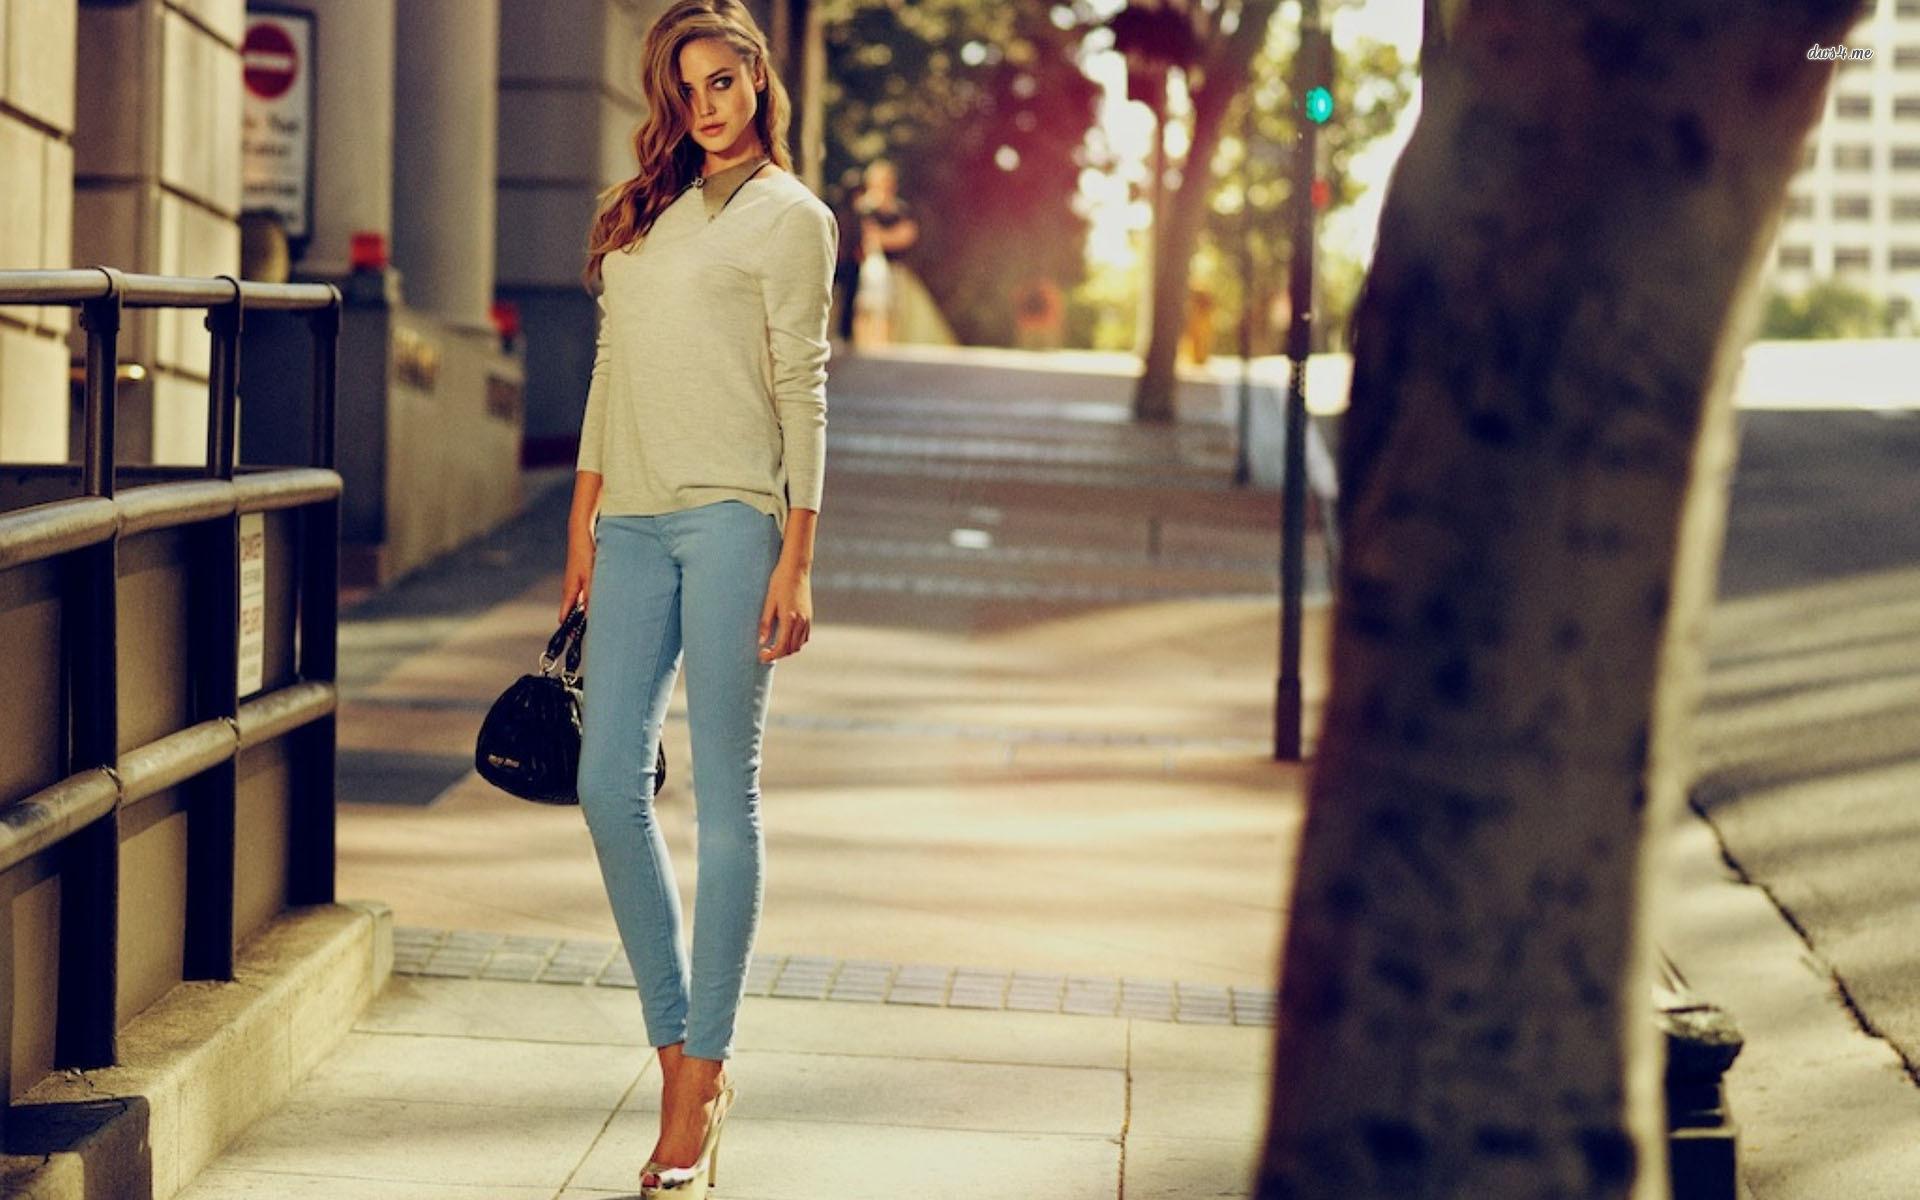 Classy girl on the street wallpaper   976075 1920x1200